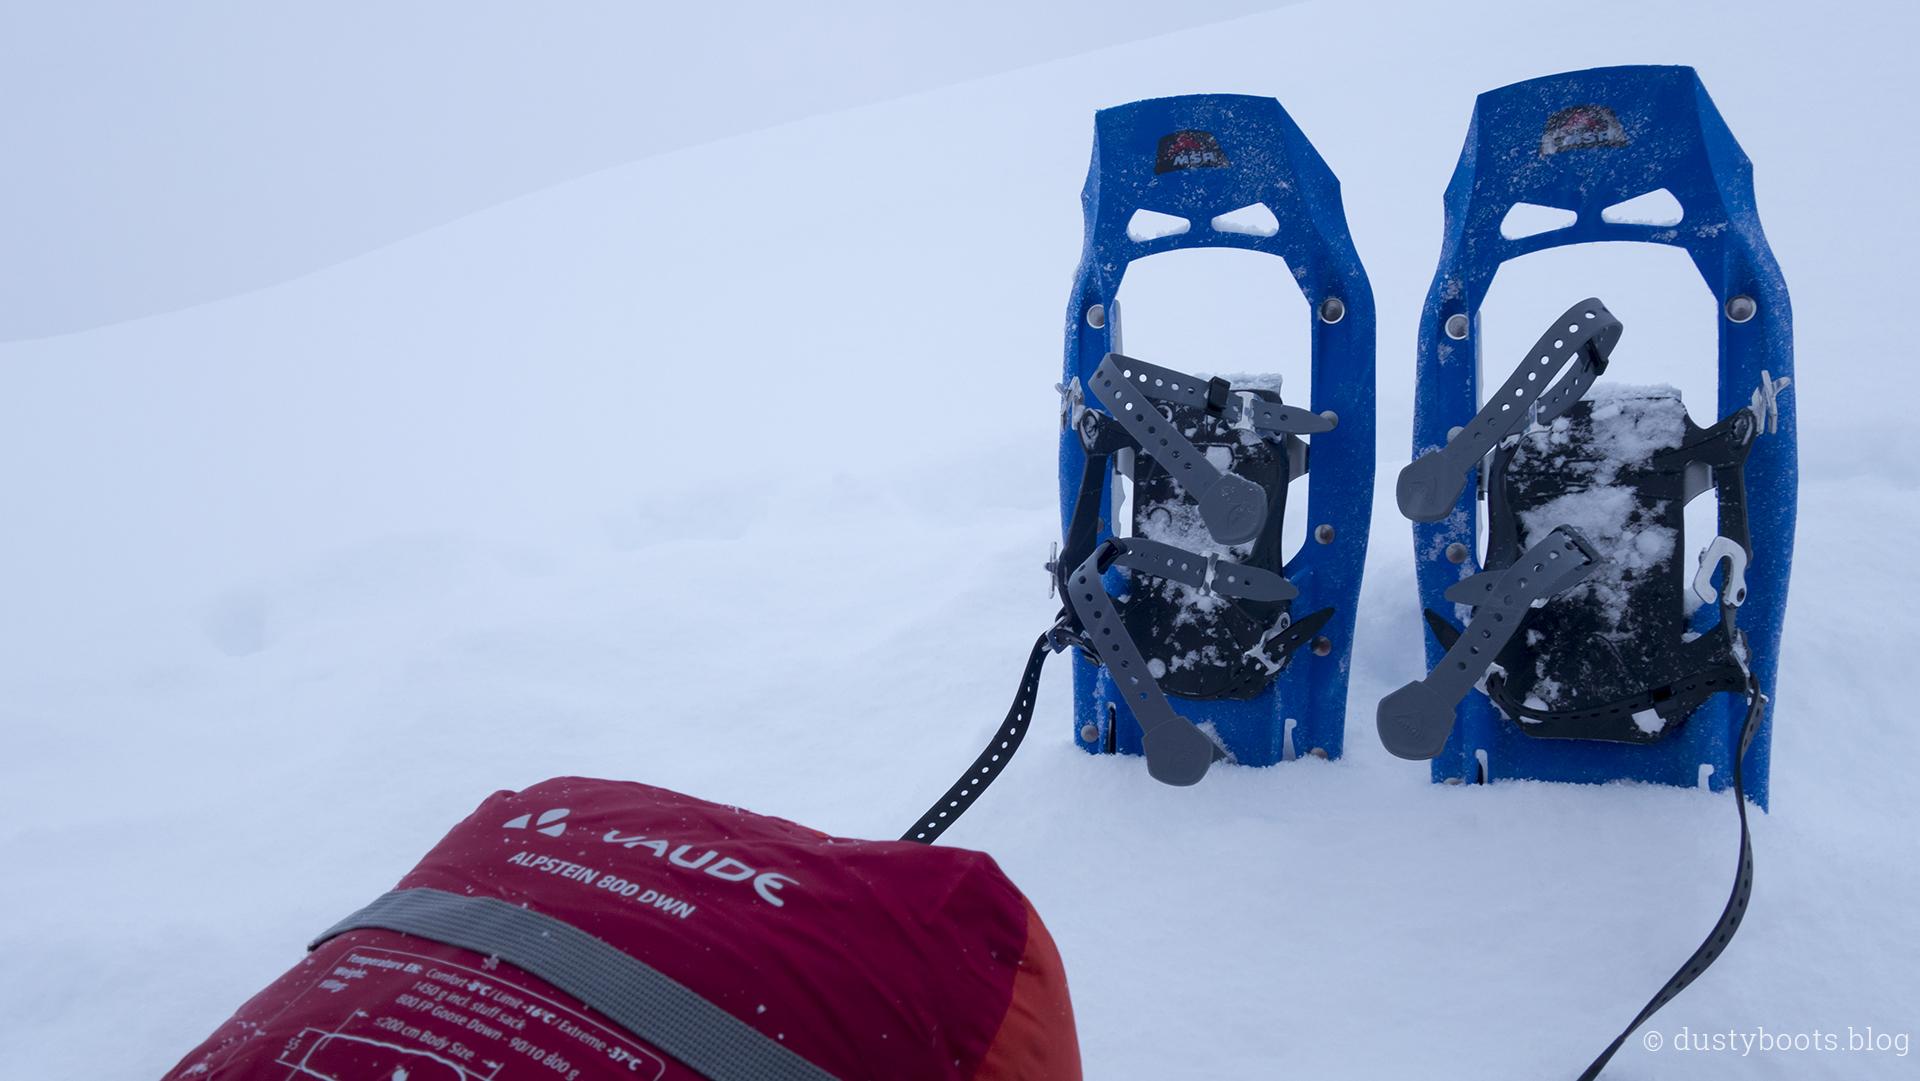 Alpstein 800 Schneeschuhe